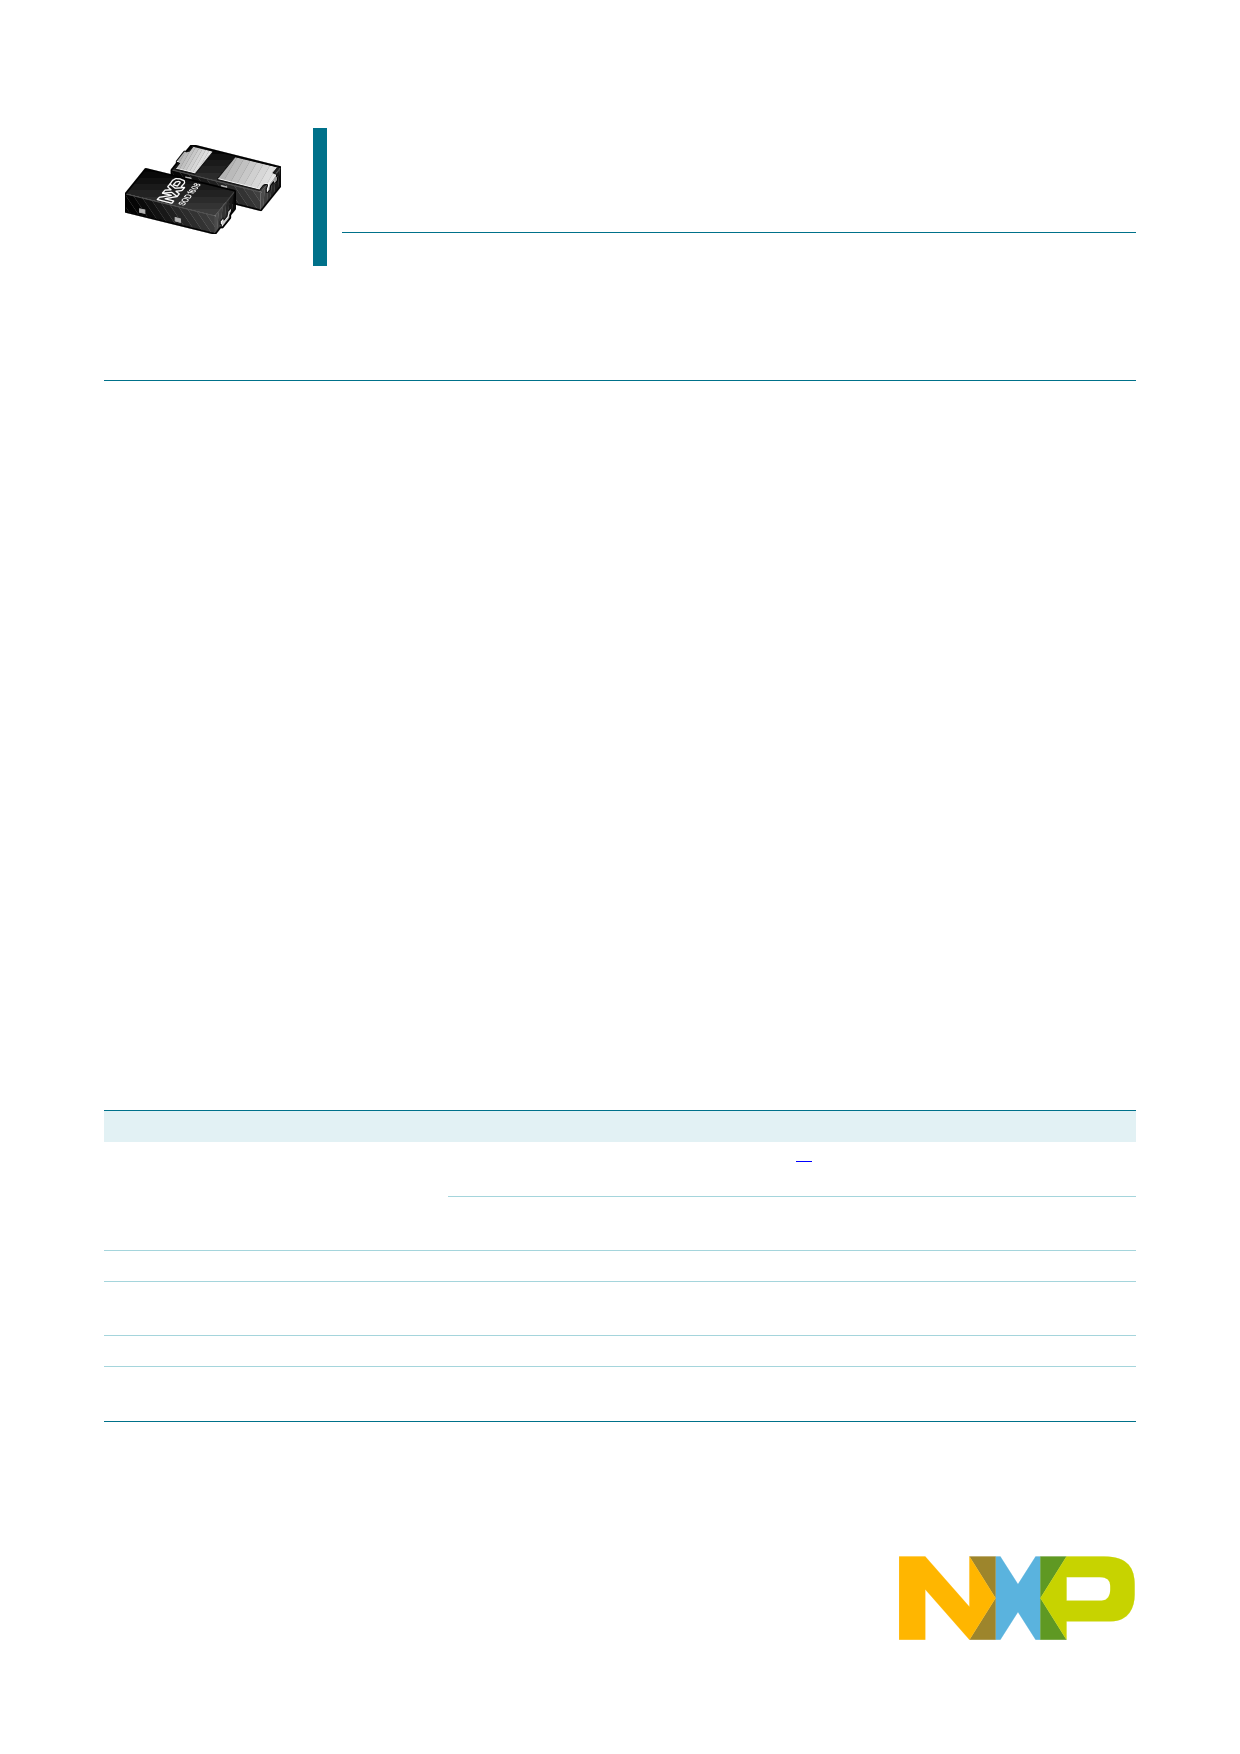 PMEG4005EPK 데이터시트 및 PMEG4005EPK PDF